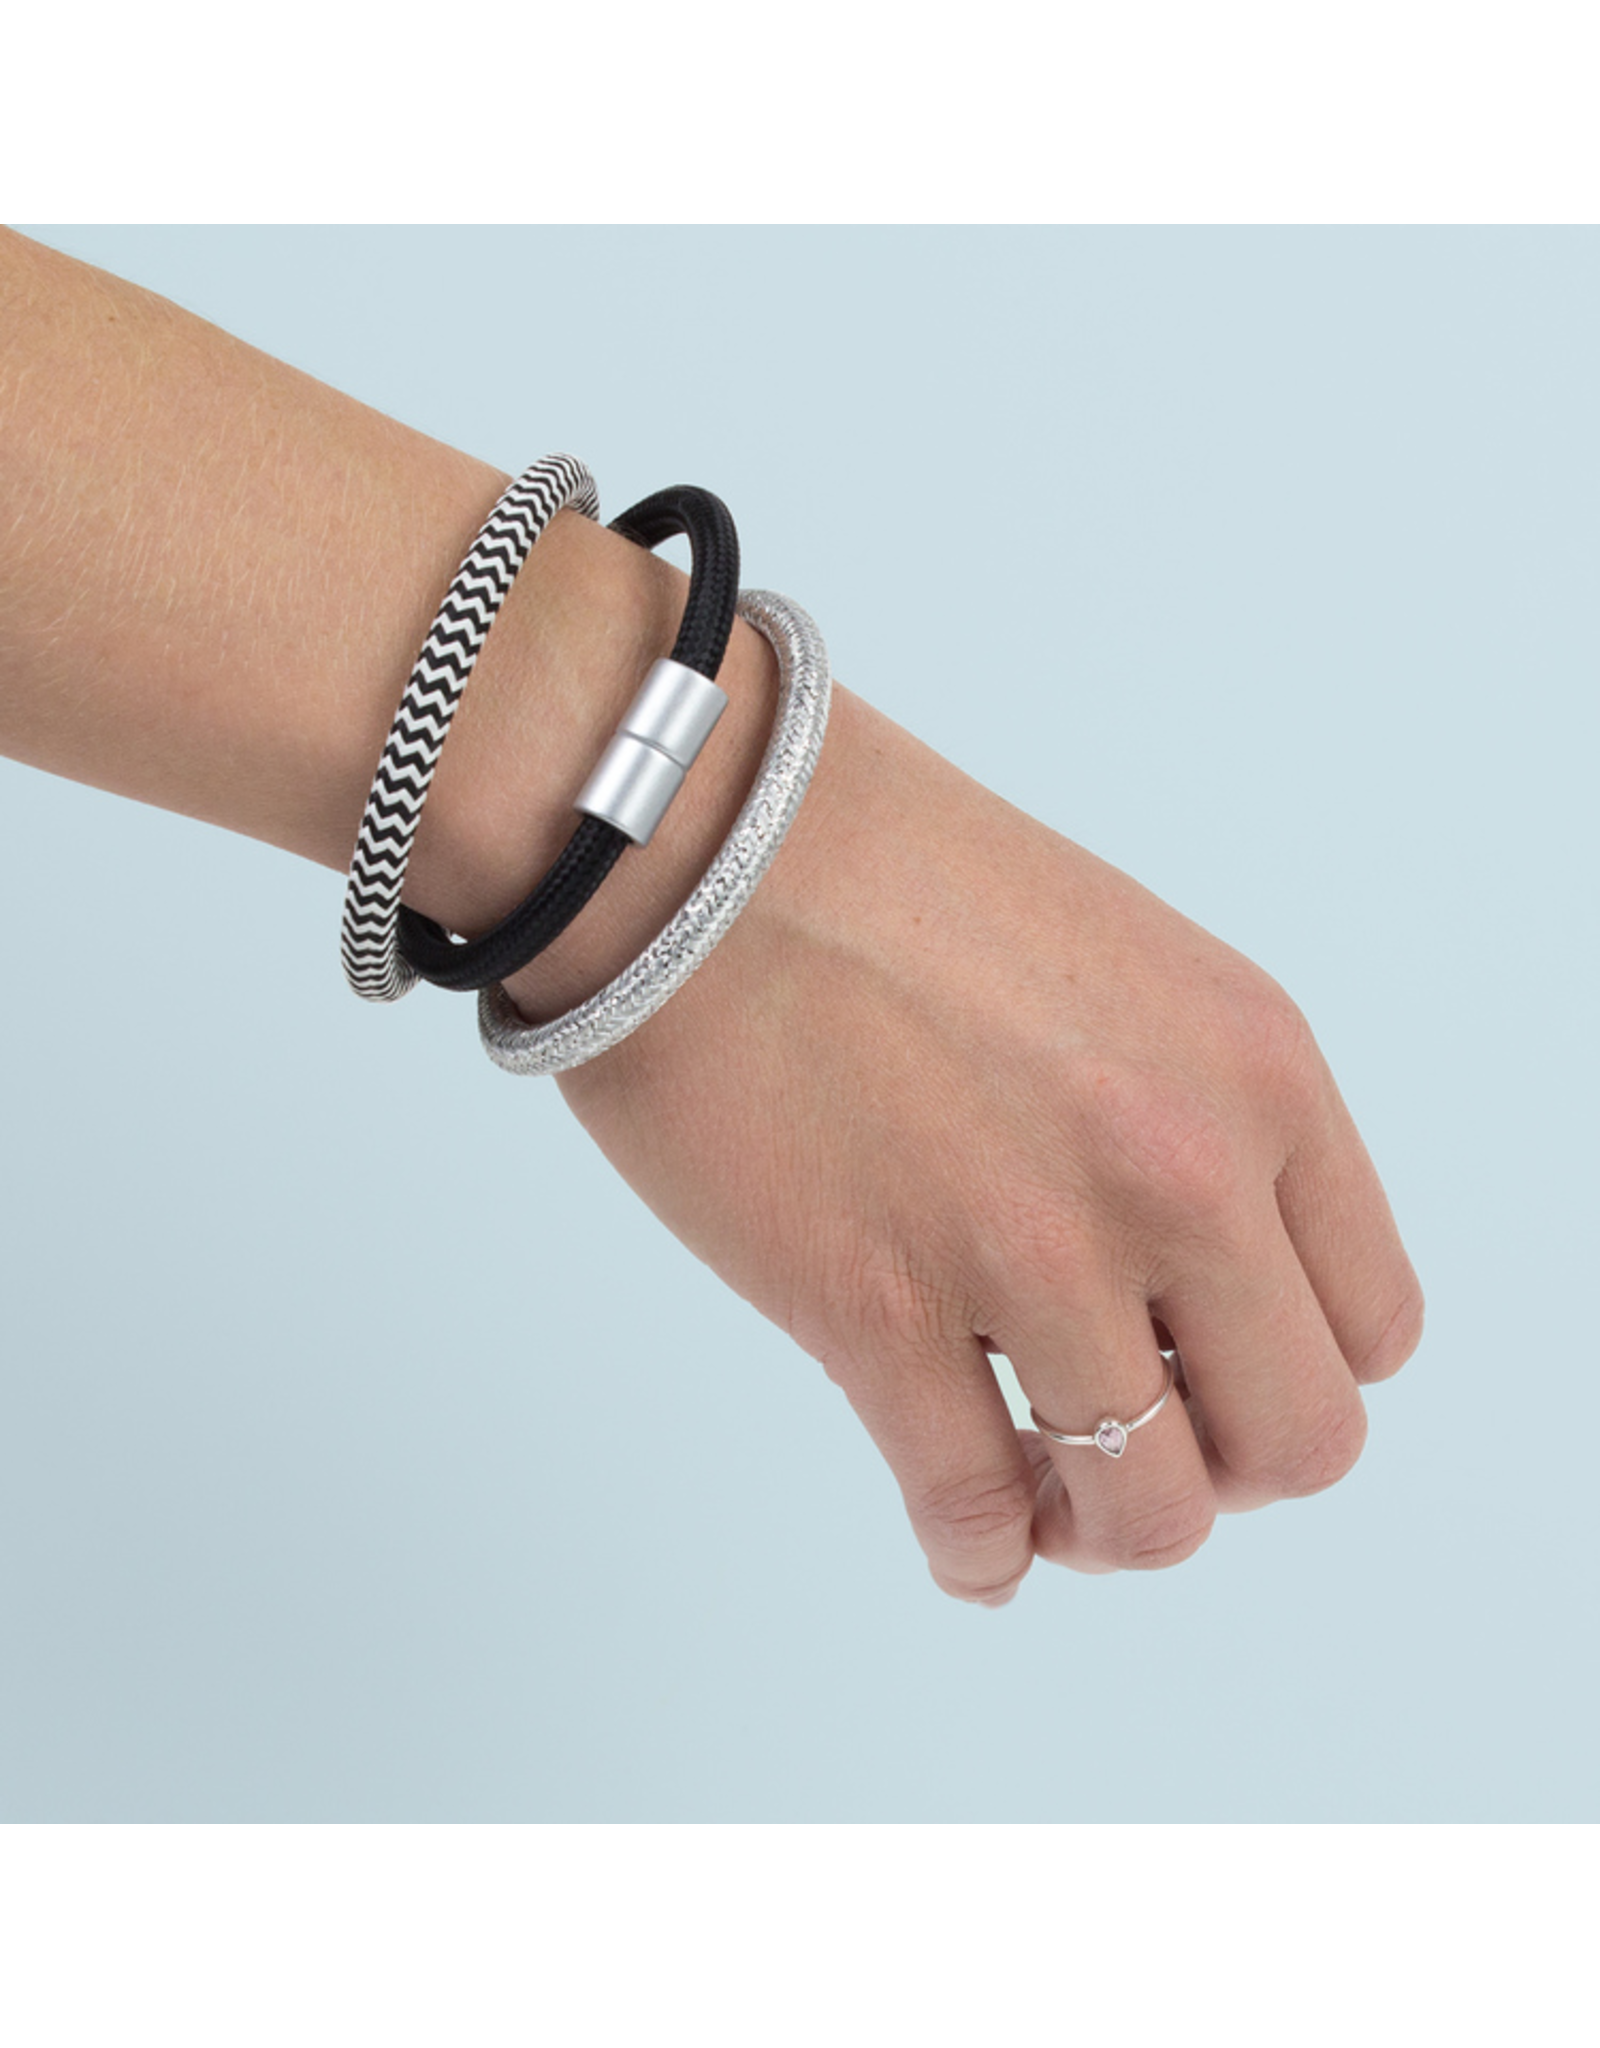 Fidea design Ka Belle Armband s blau/weiss